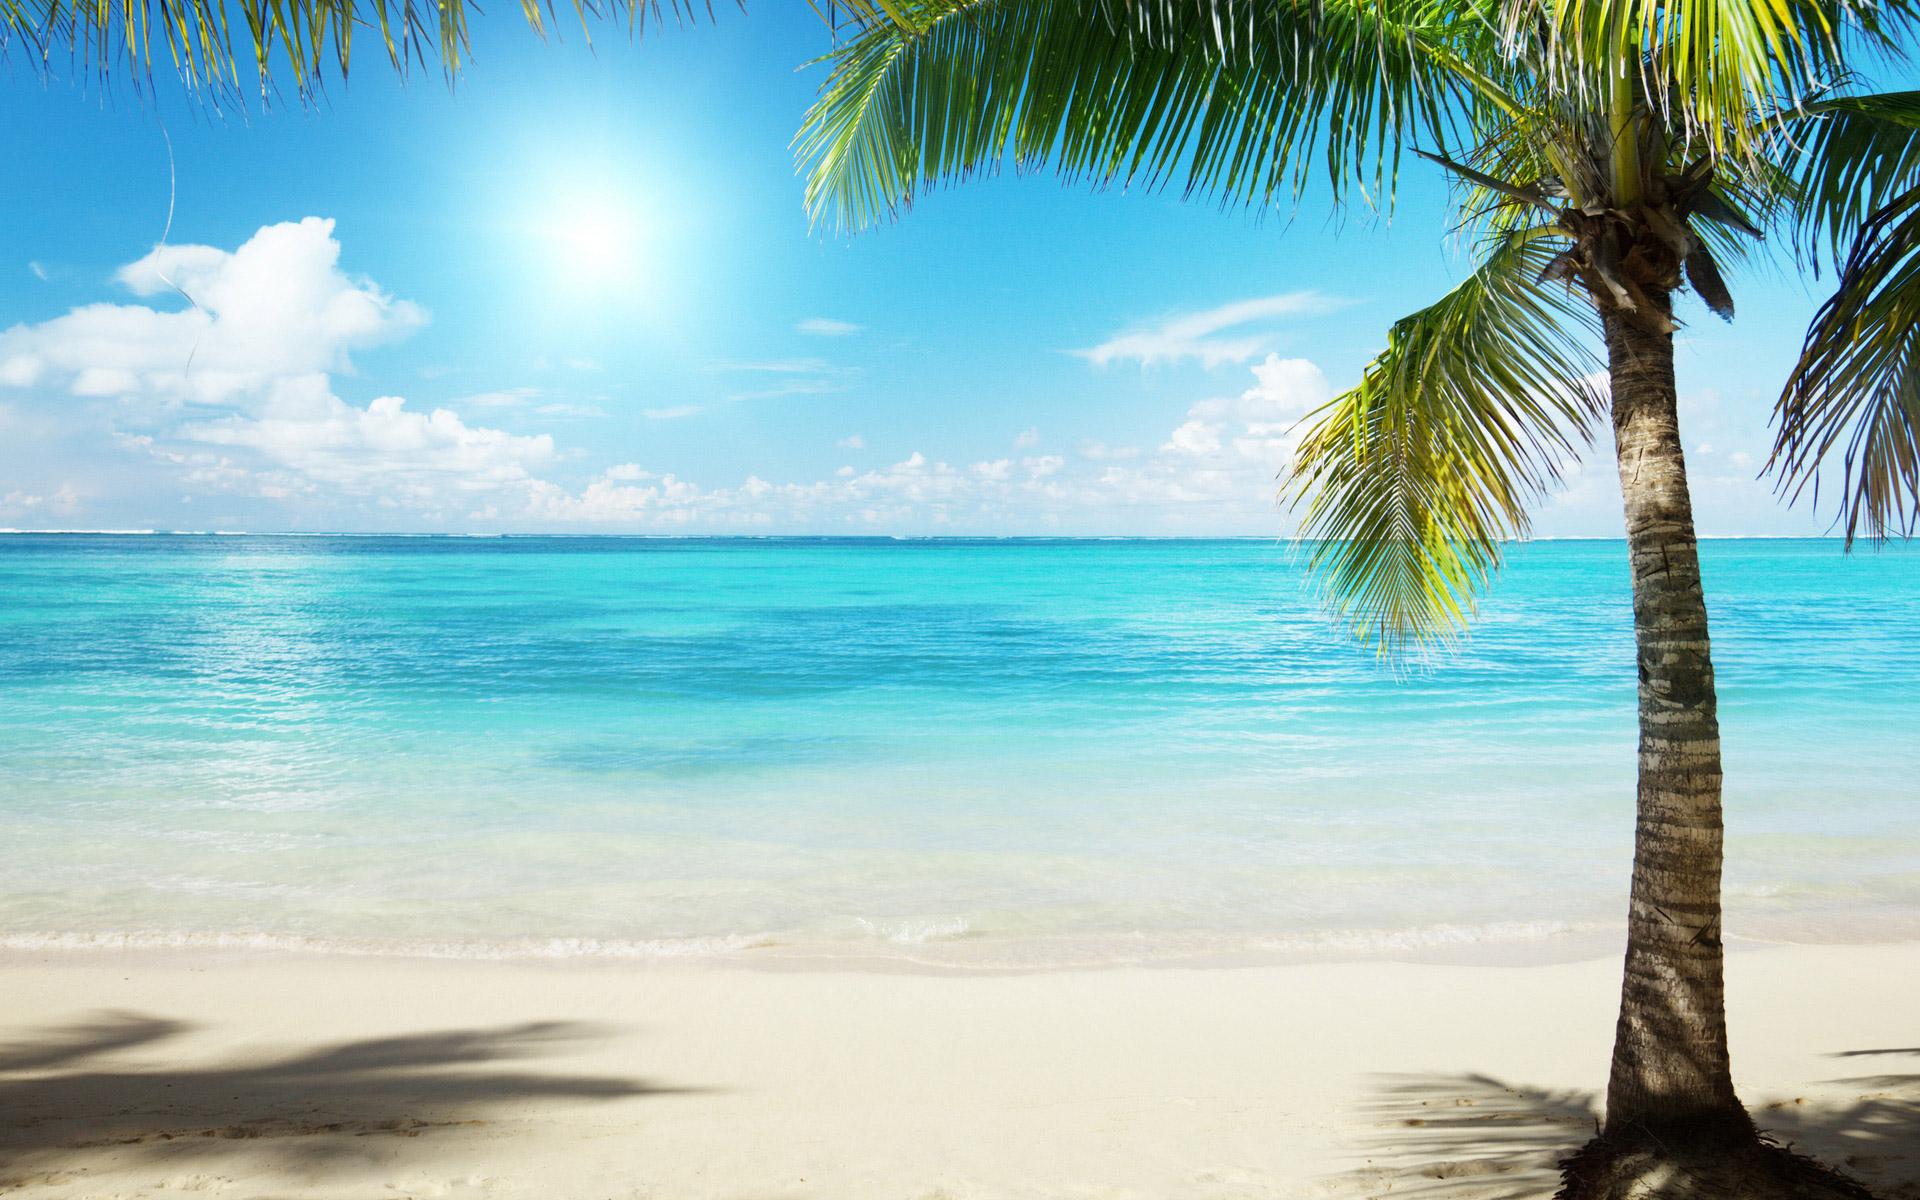 Beautiful Beach HD Wallpaper 2015 for Desktop beautiful beach 1920x1200